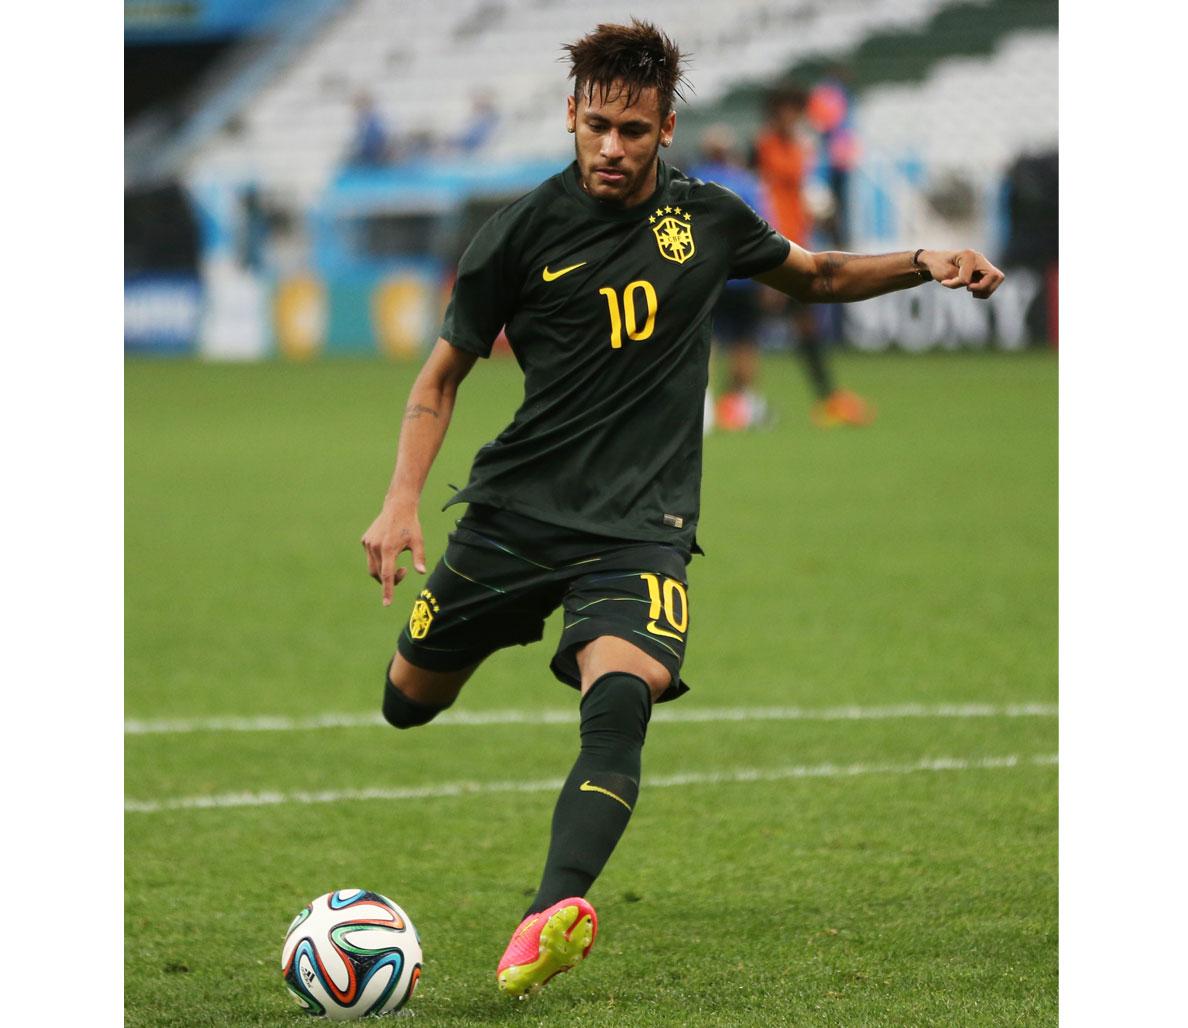 neymar hd wallpapers free download